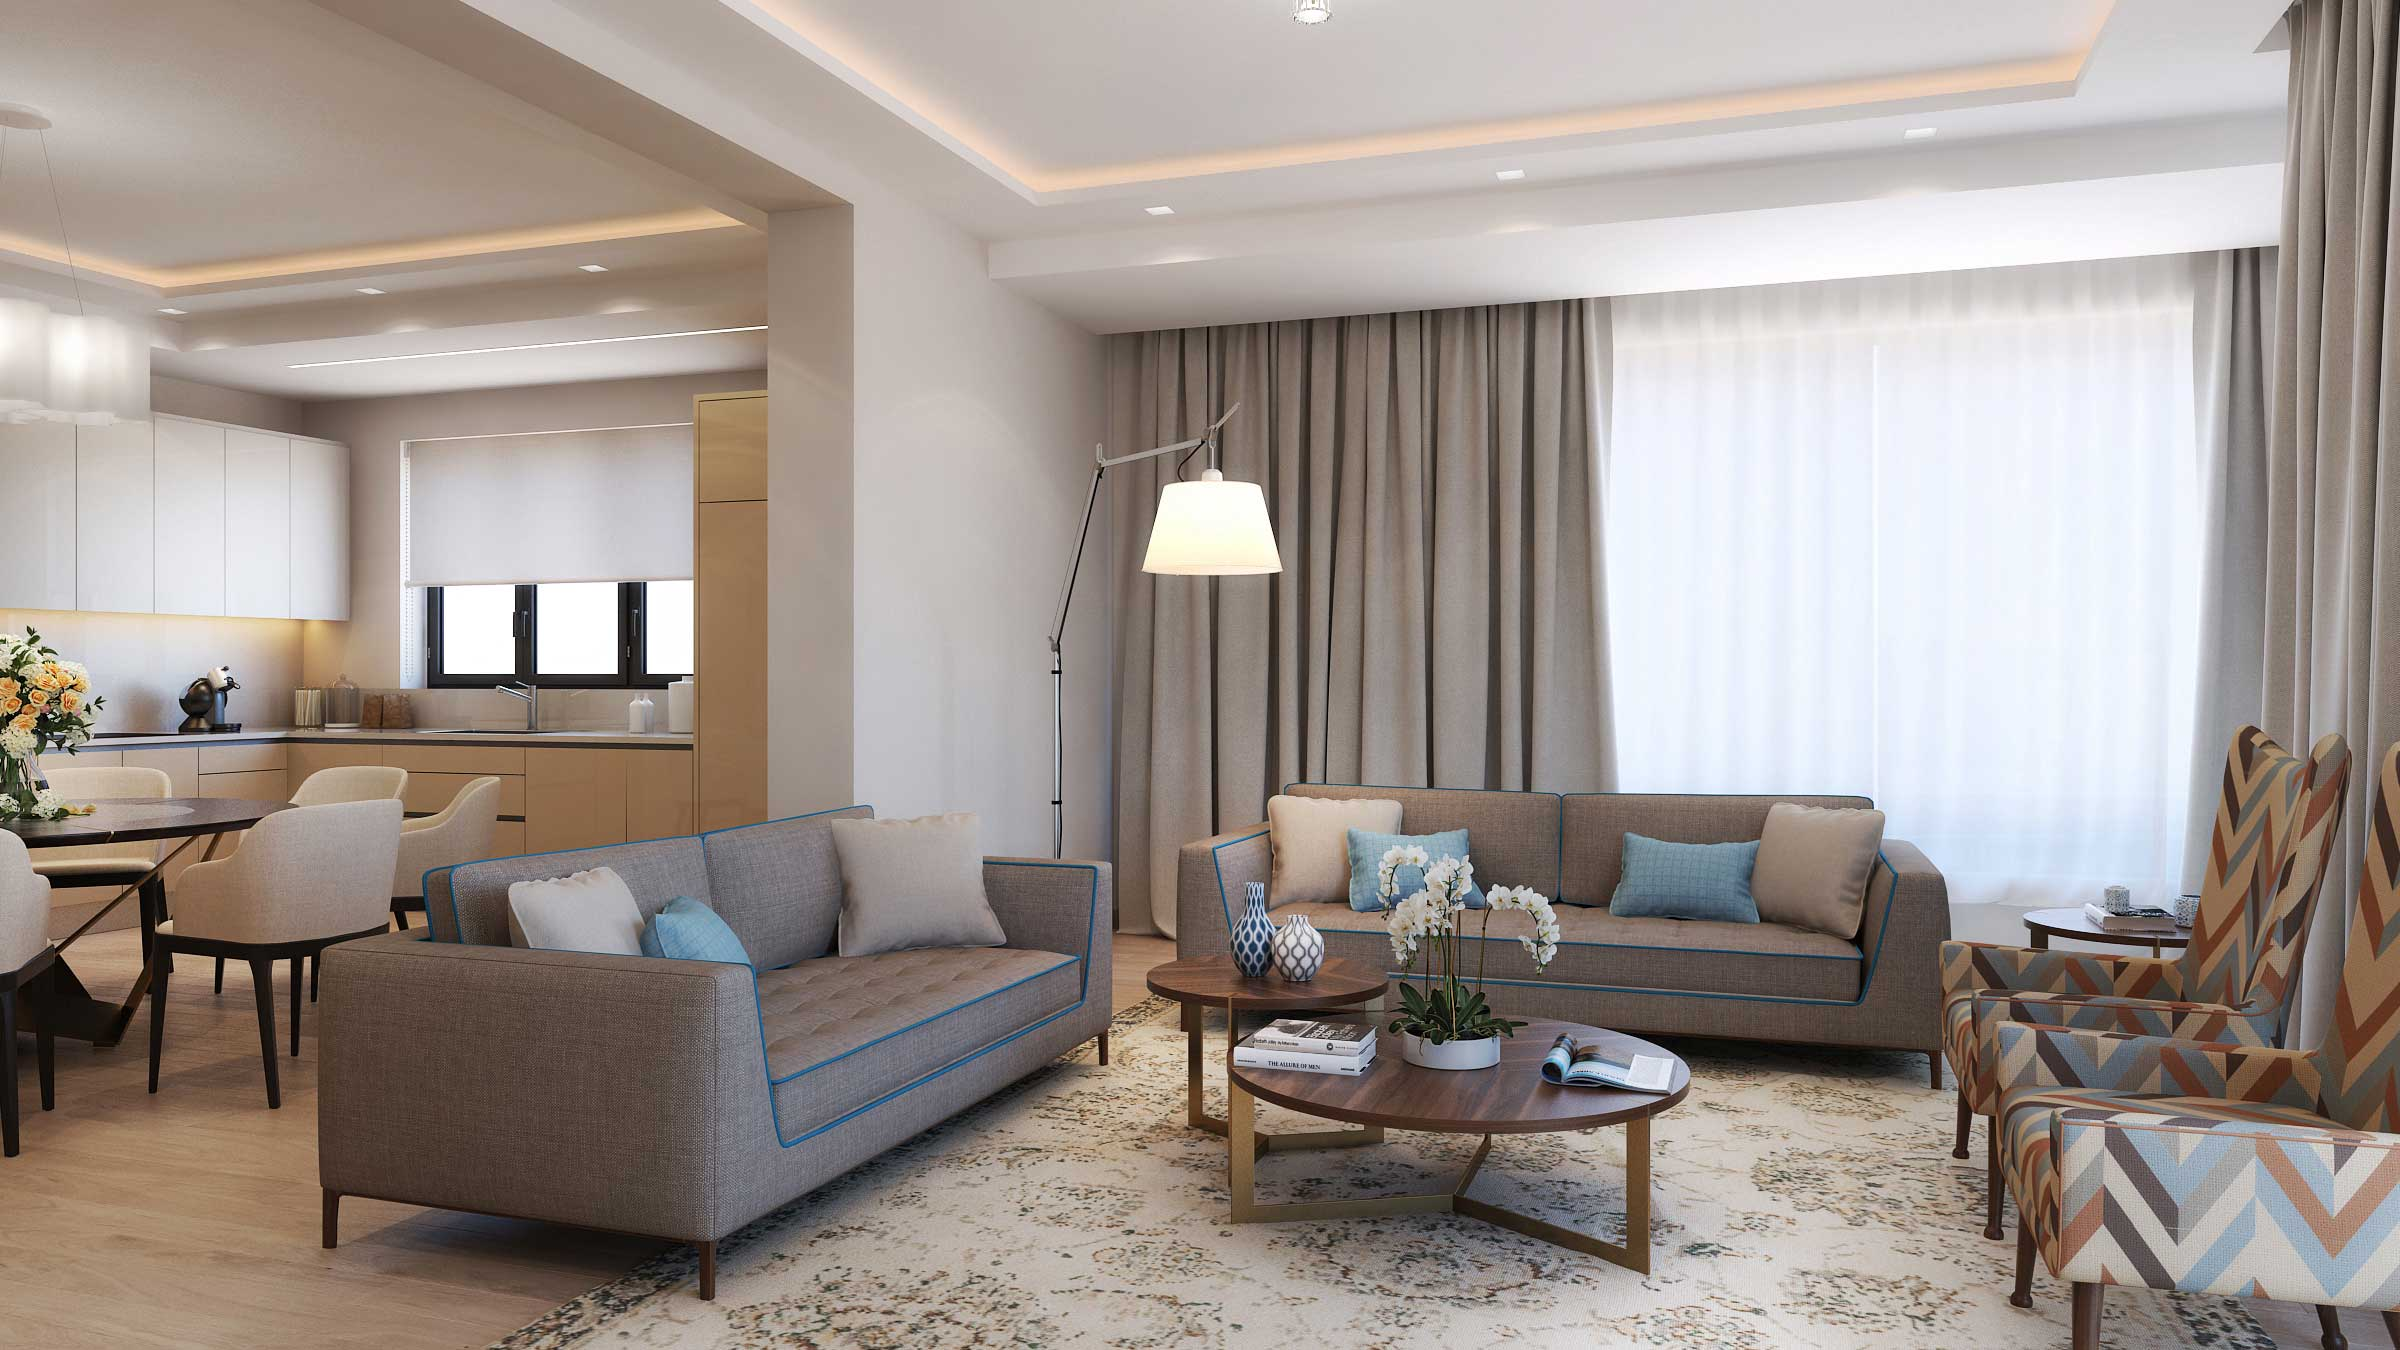 Apartman, Hotel SUNRAF, Rafailovići, Crna Gora